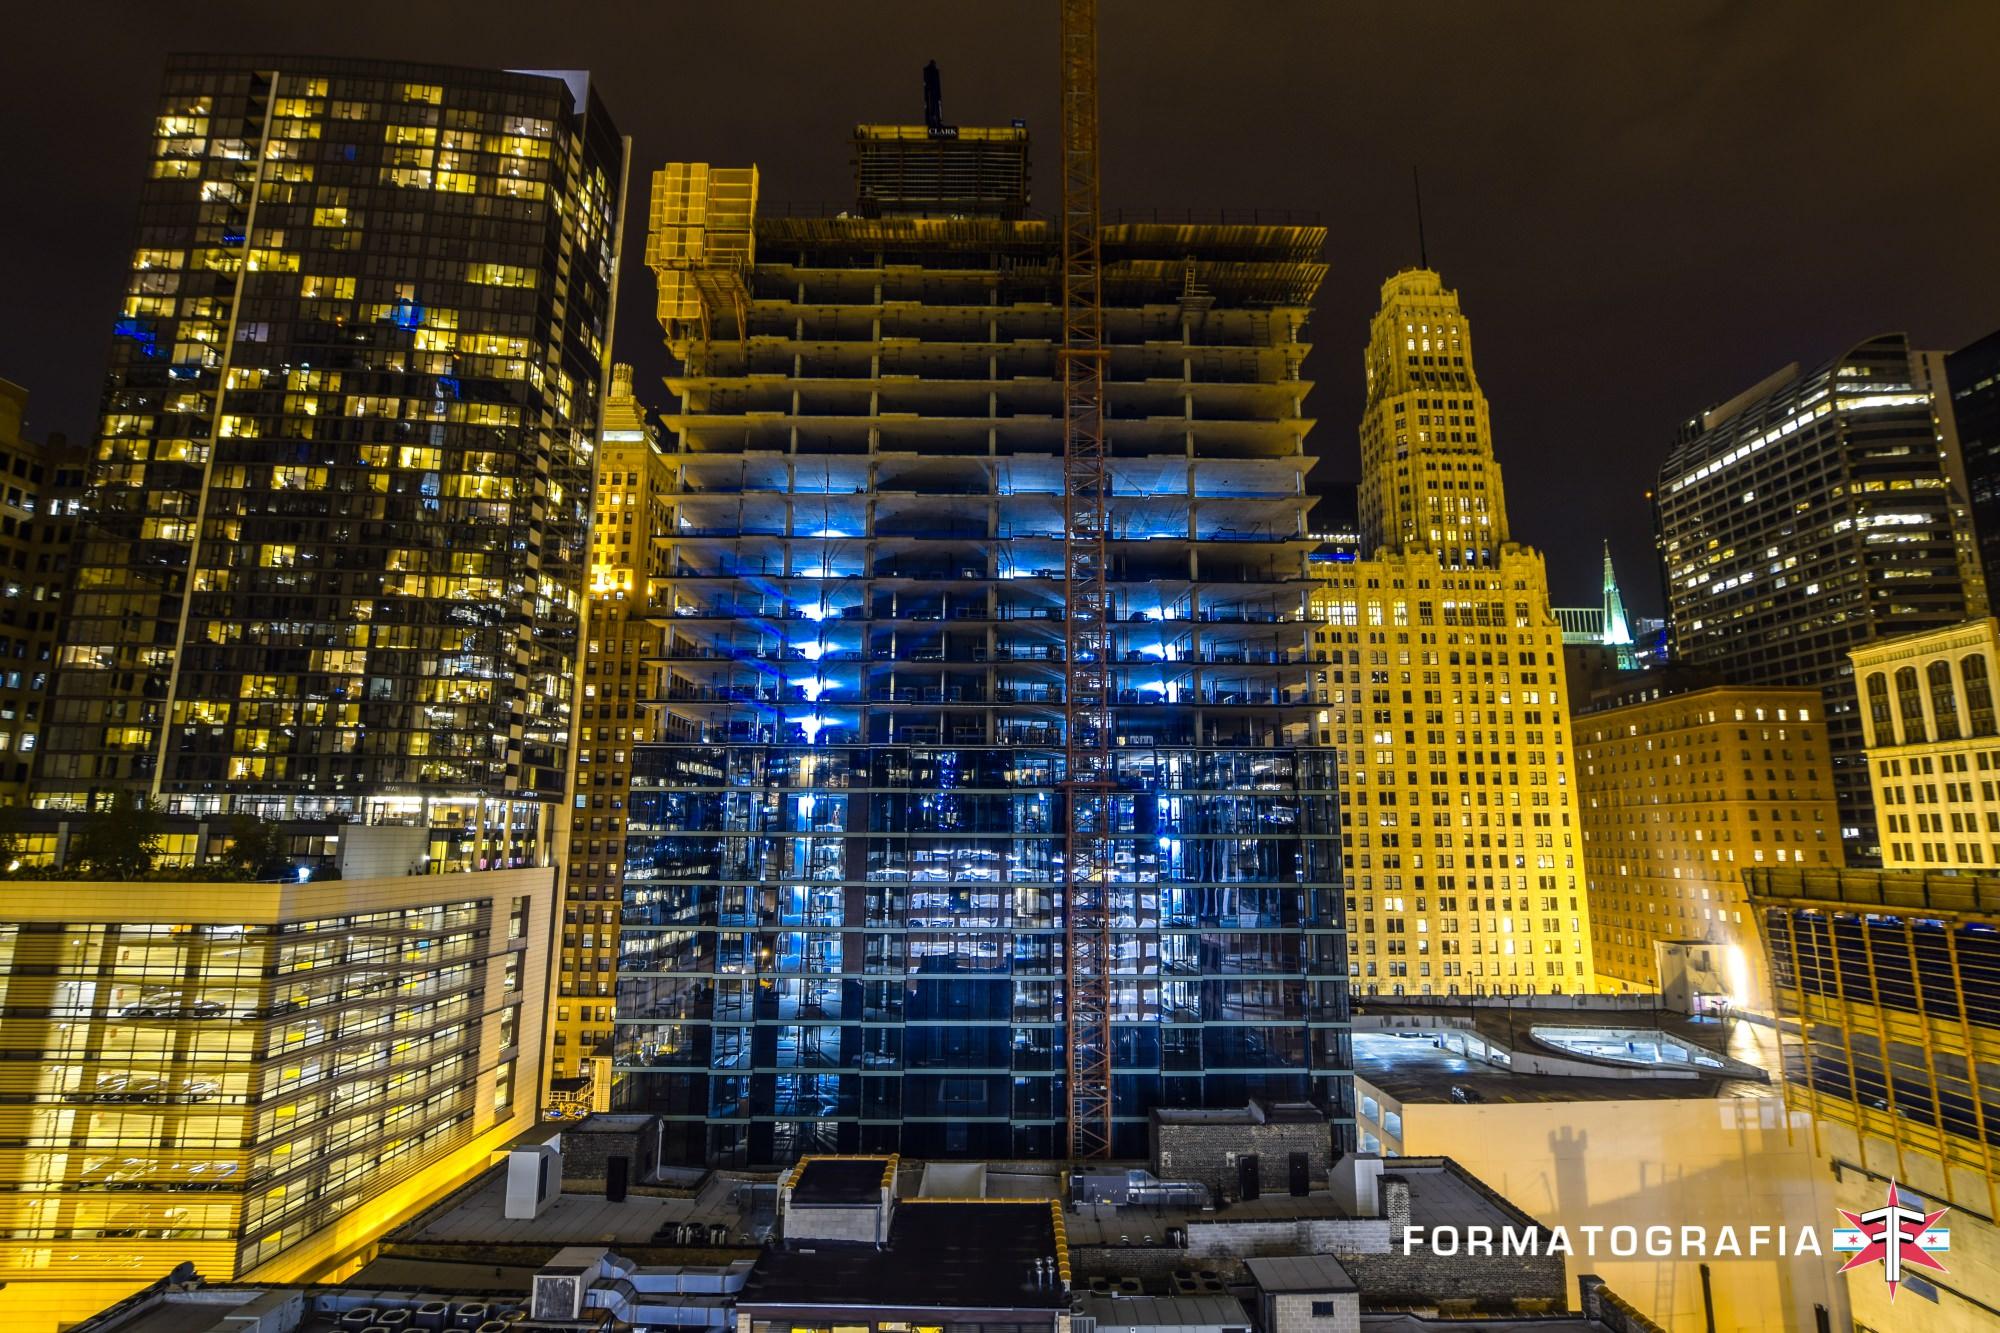 eric formato chicago photographer fall update city architecture shotsDSC_0055.jpg